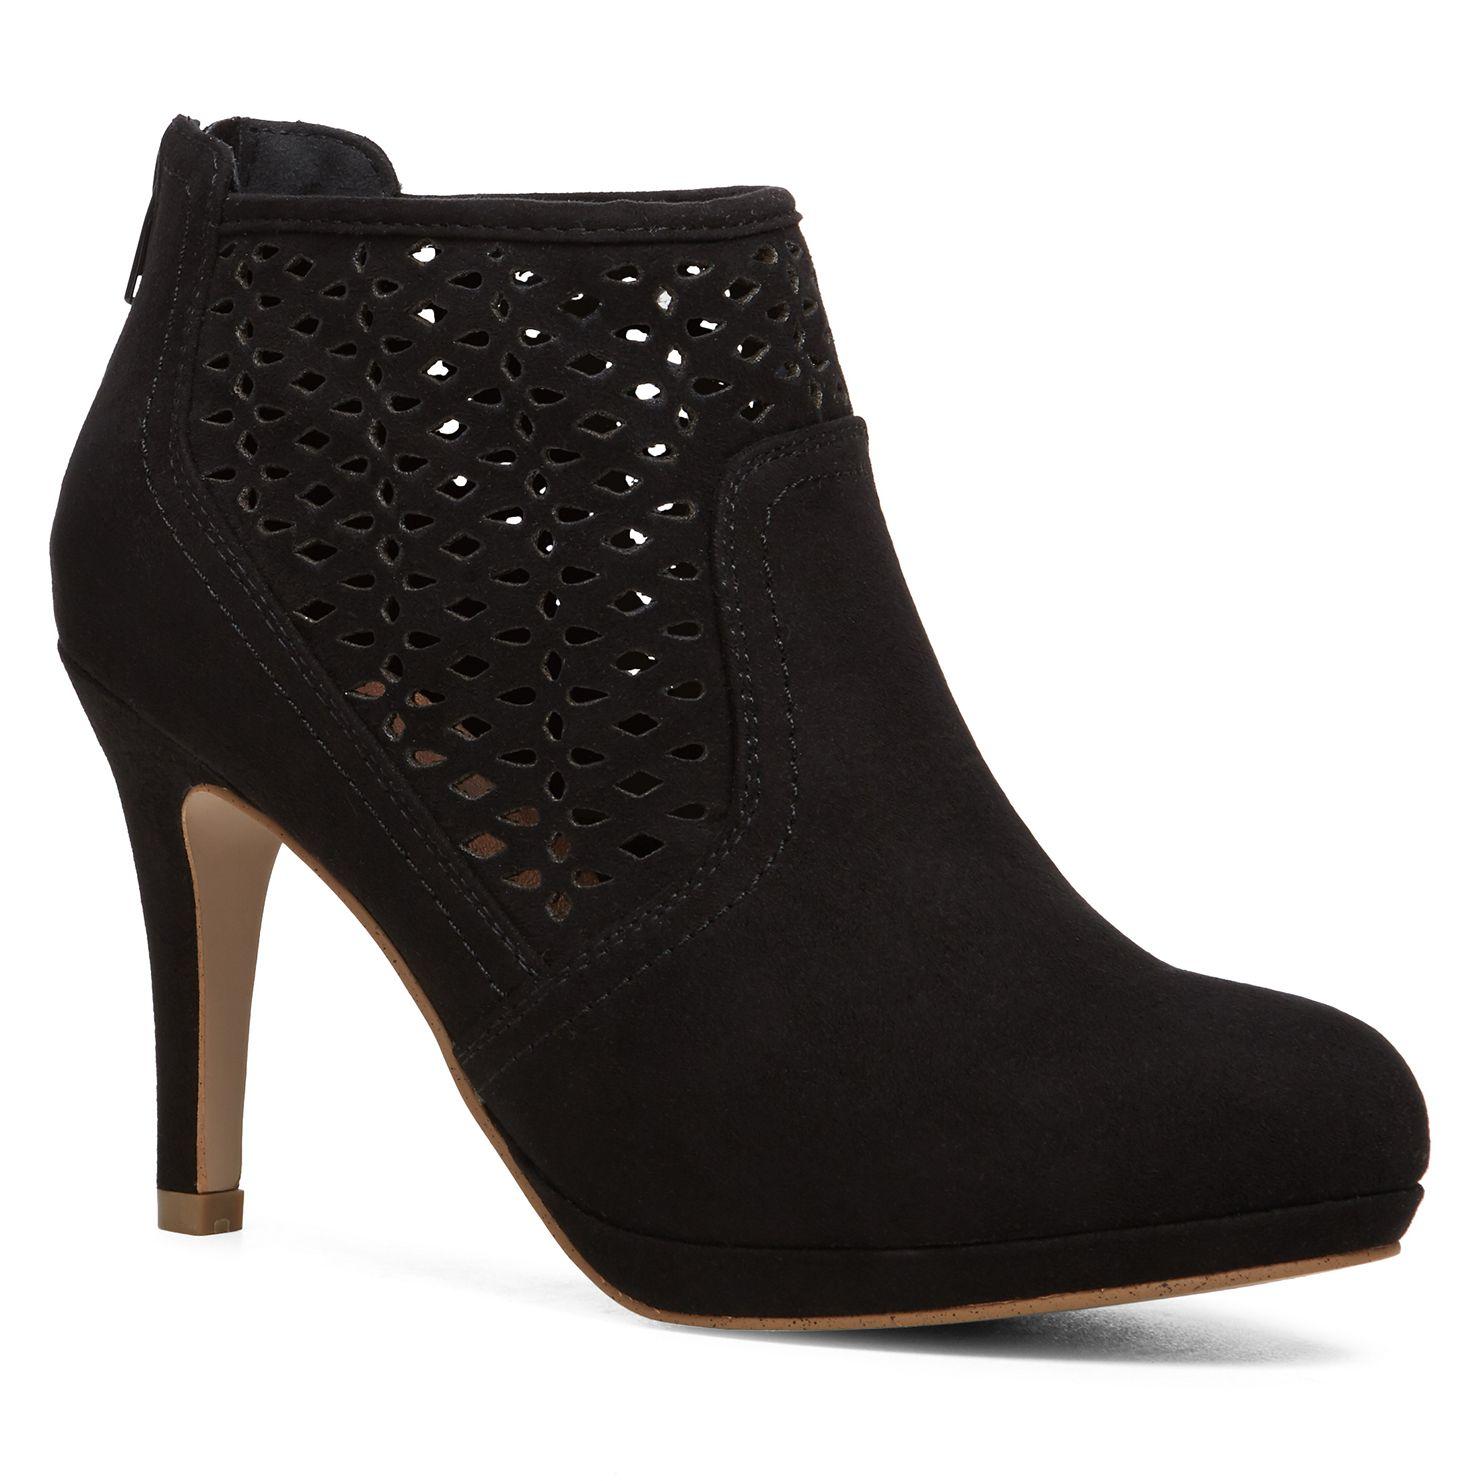 MERILDEE à Mode Canada Globo femmes talon pour haut Chaussures SR5nHprqwS